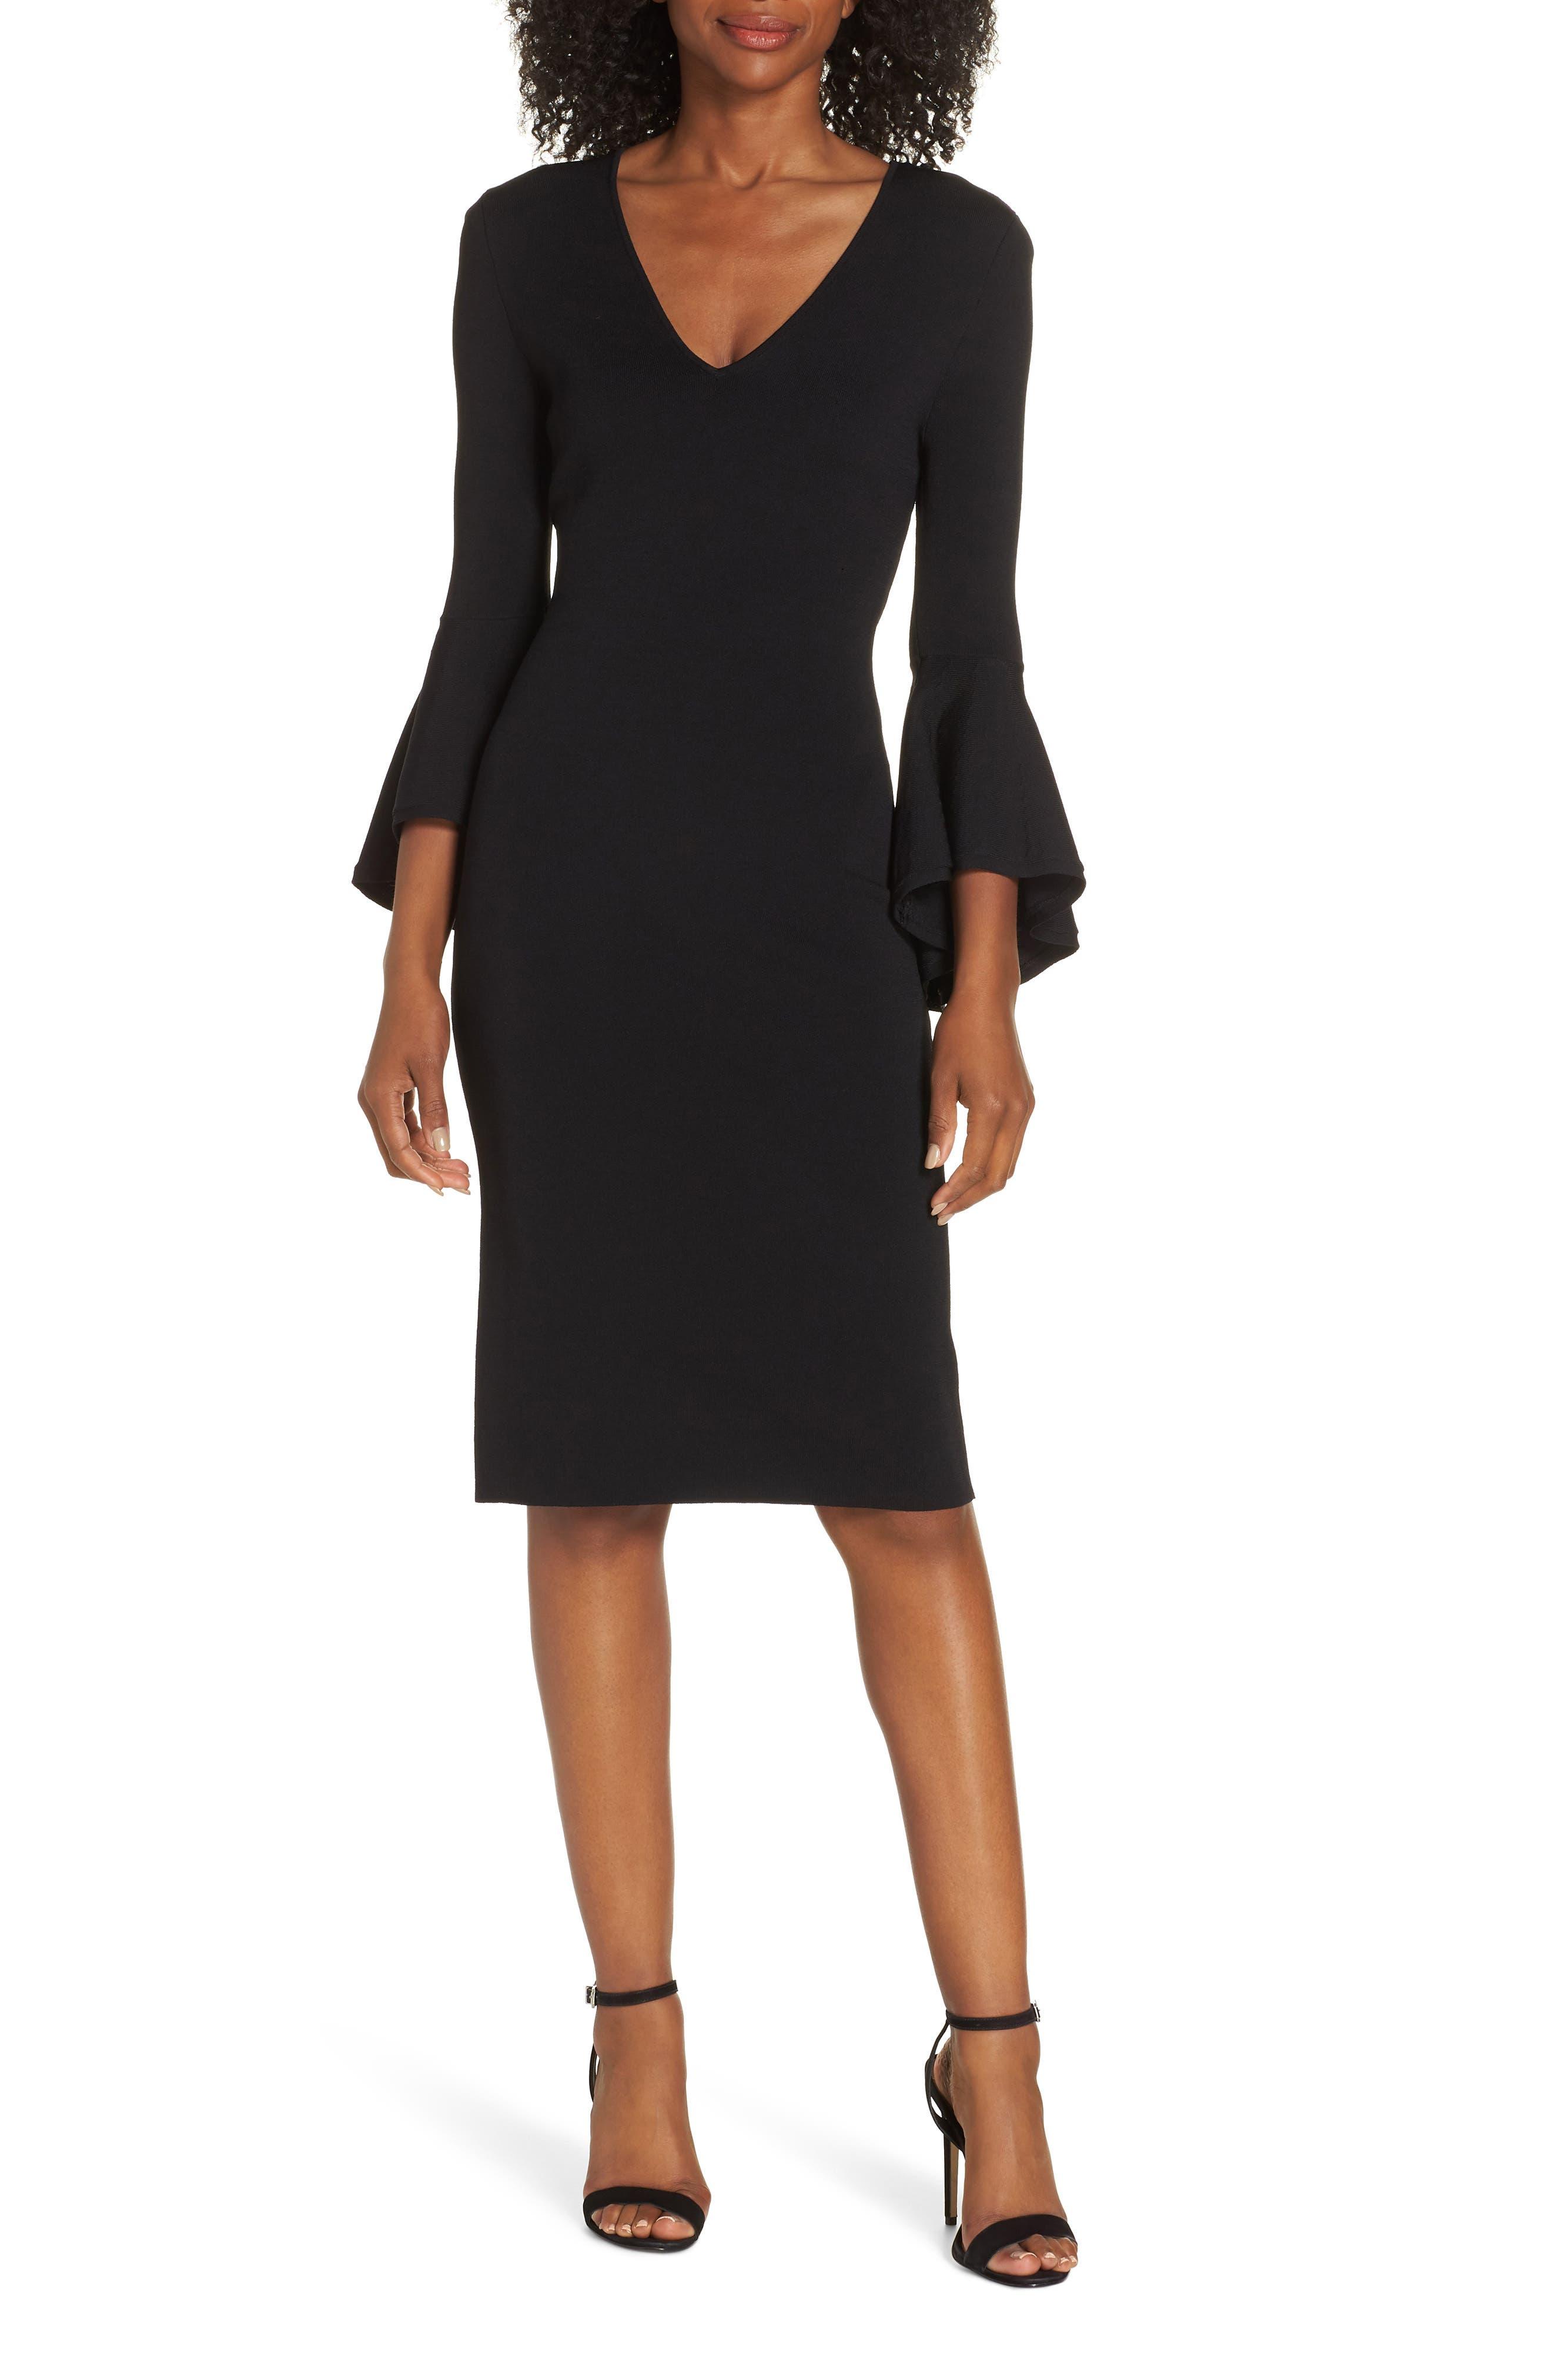 ELIZA J, Bell Sleeve Sheath Dress, Main thumbnail 1, color, BLACK